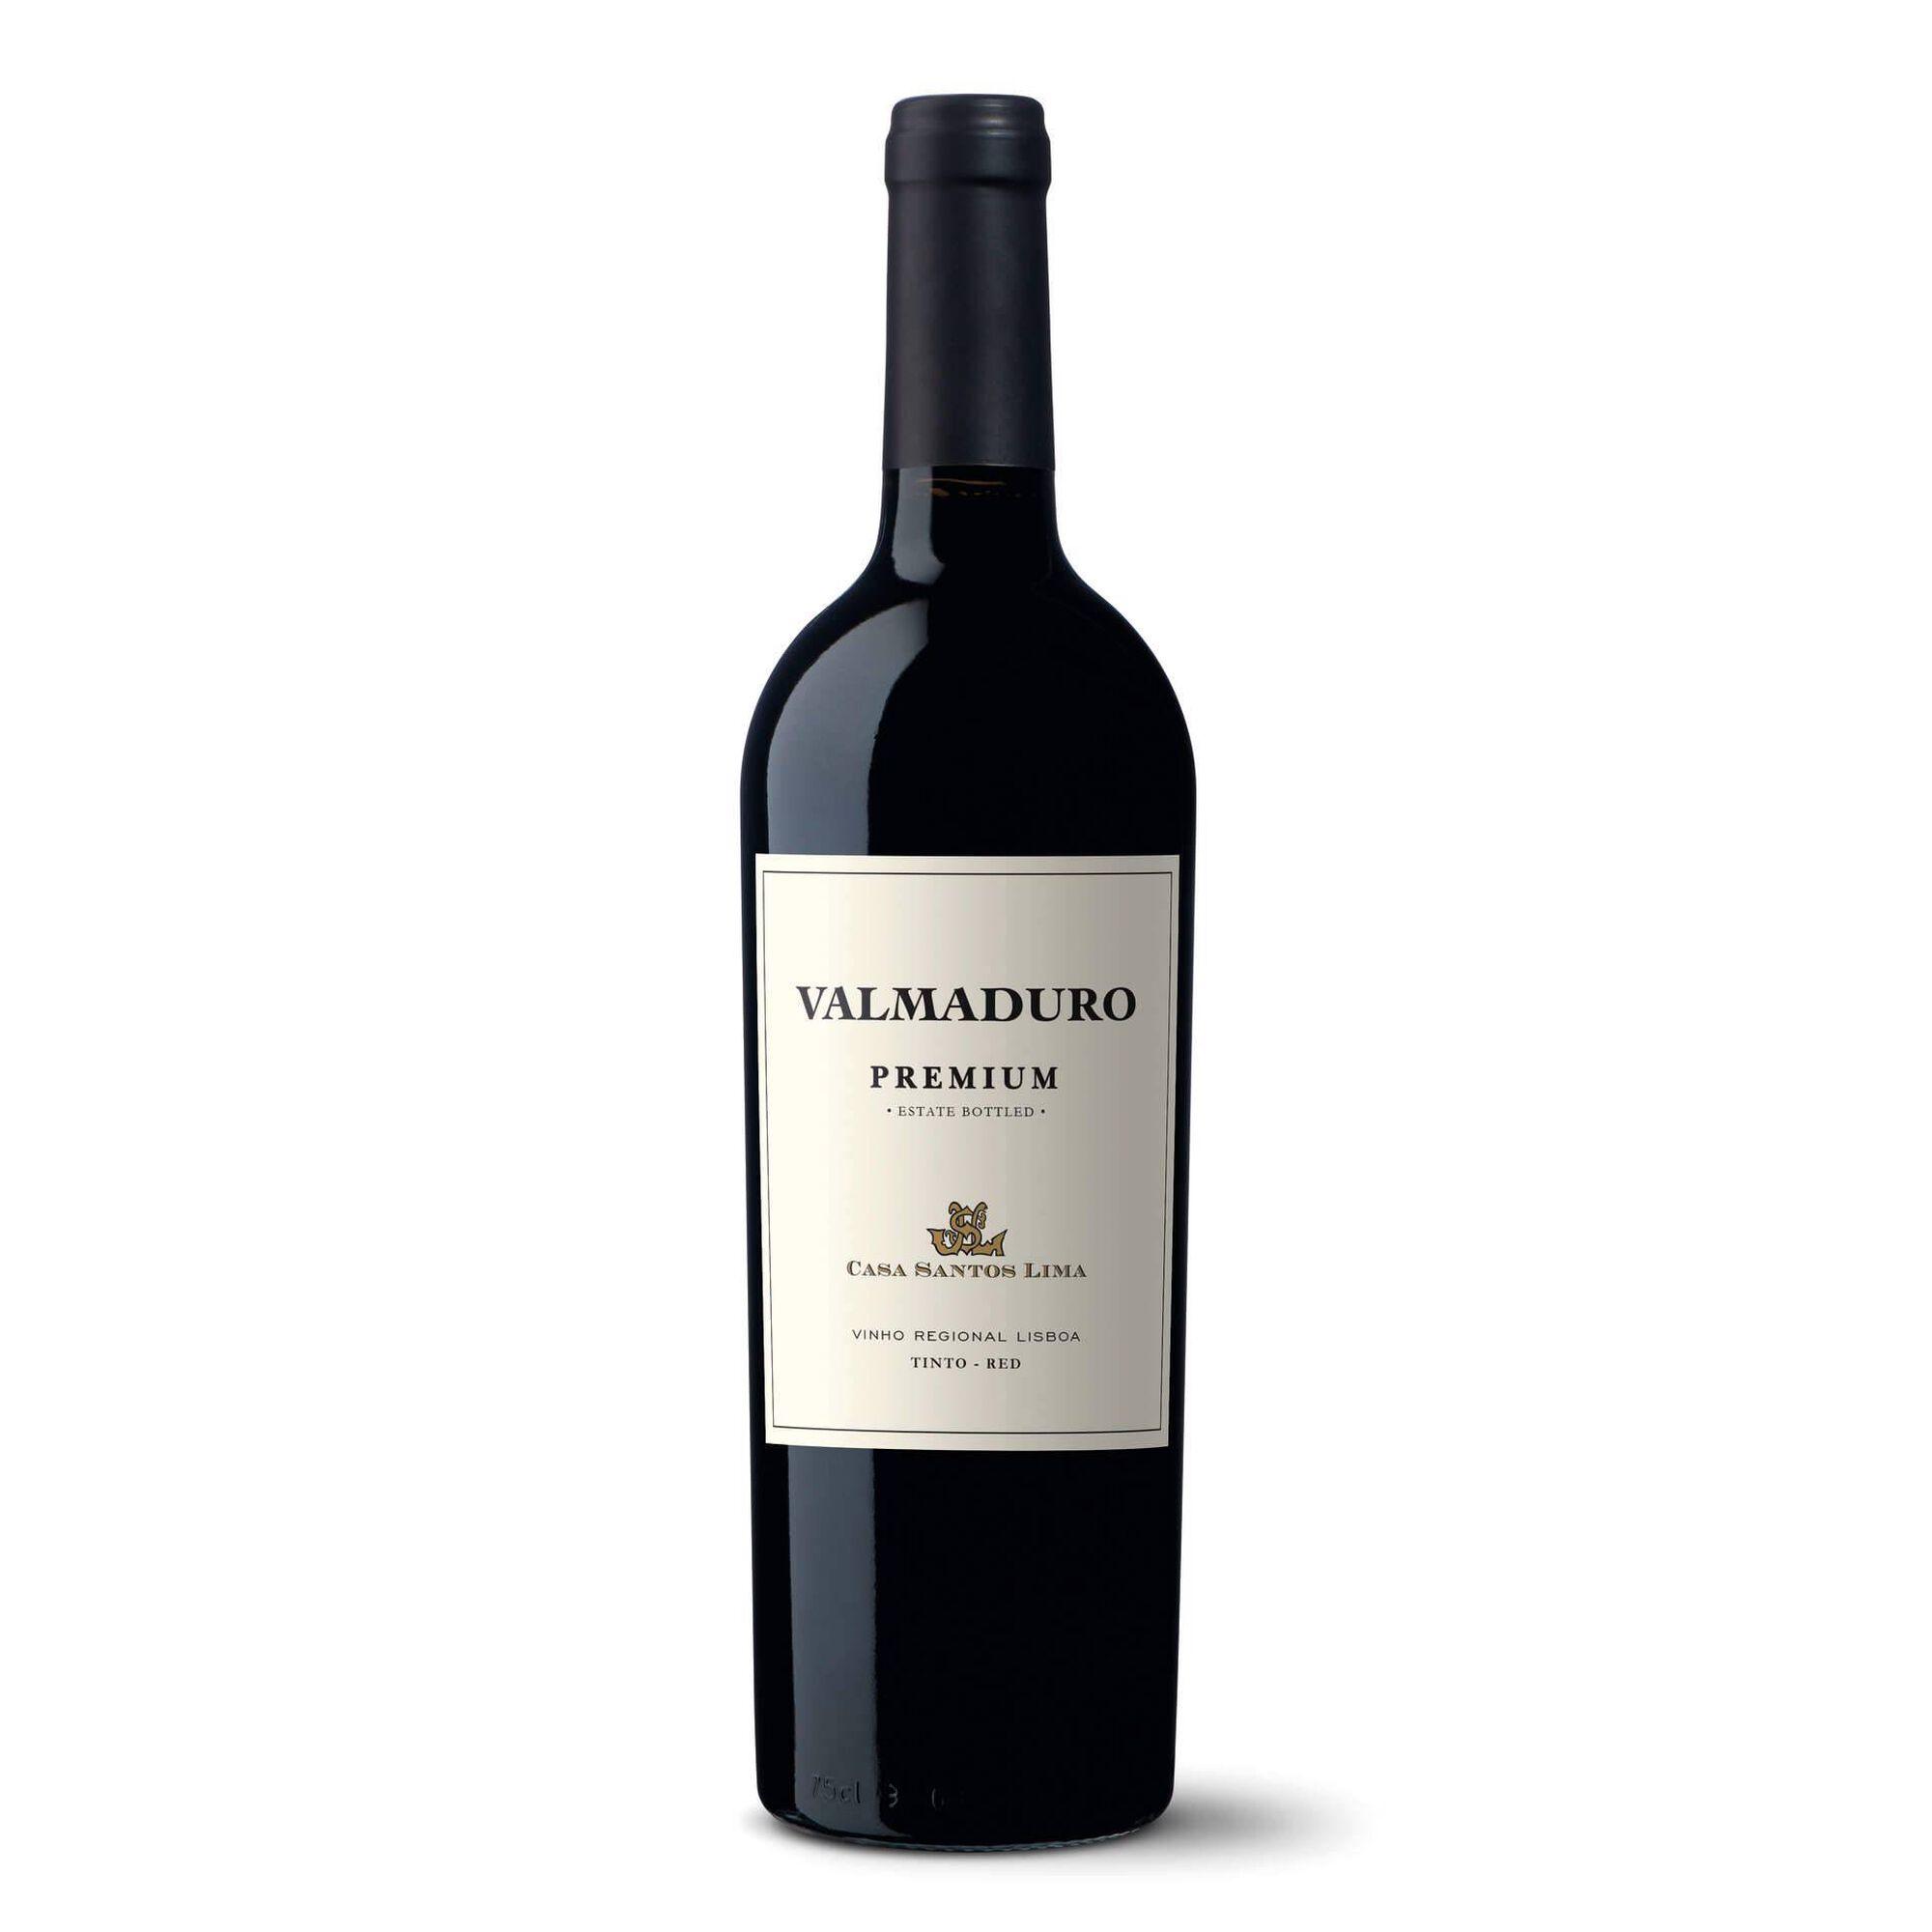 Valmaduro Premium Regional Lisboa Vinho Tinto